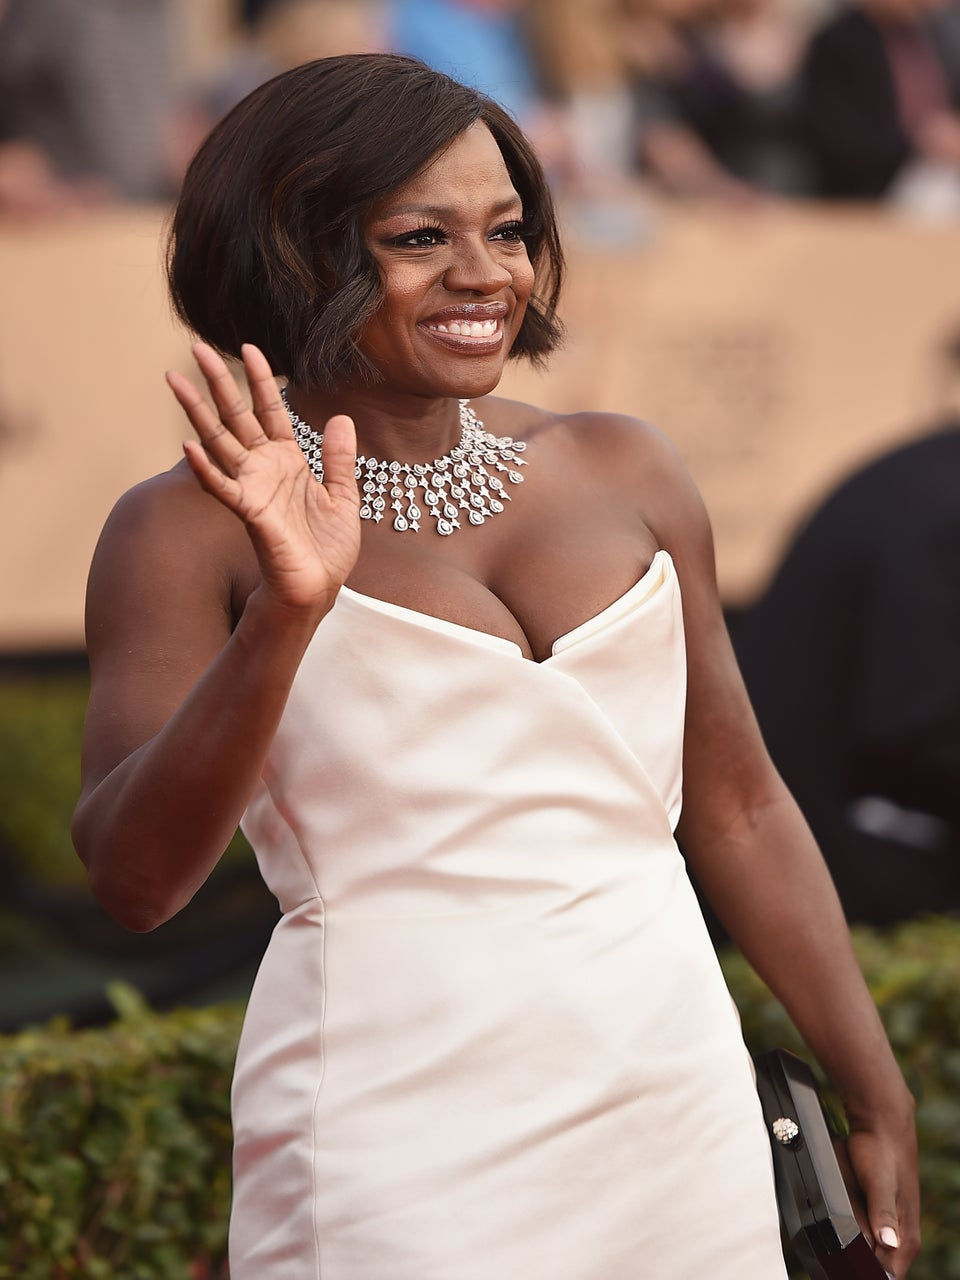 Viola Davis Makes History As First Black Woman To Win Five SAG Awards